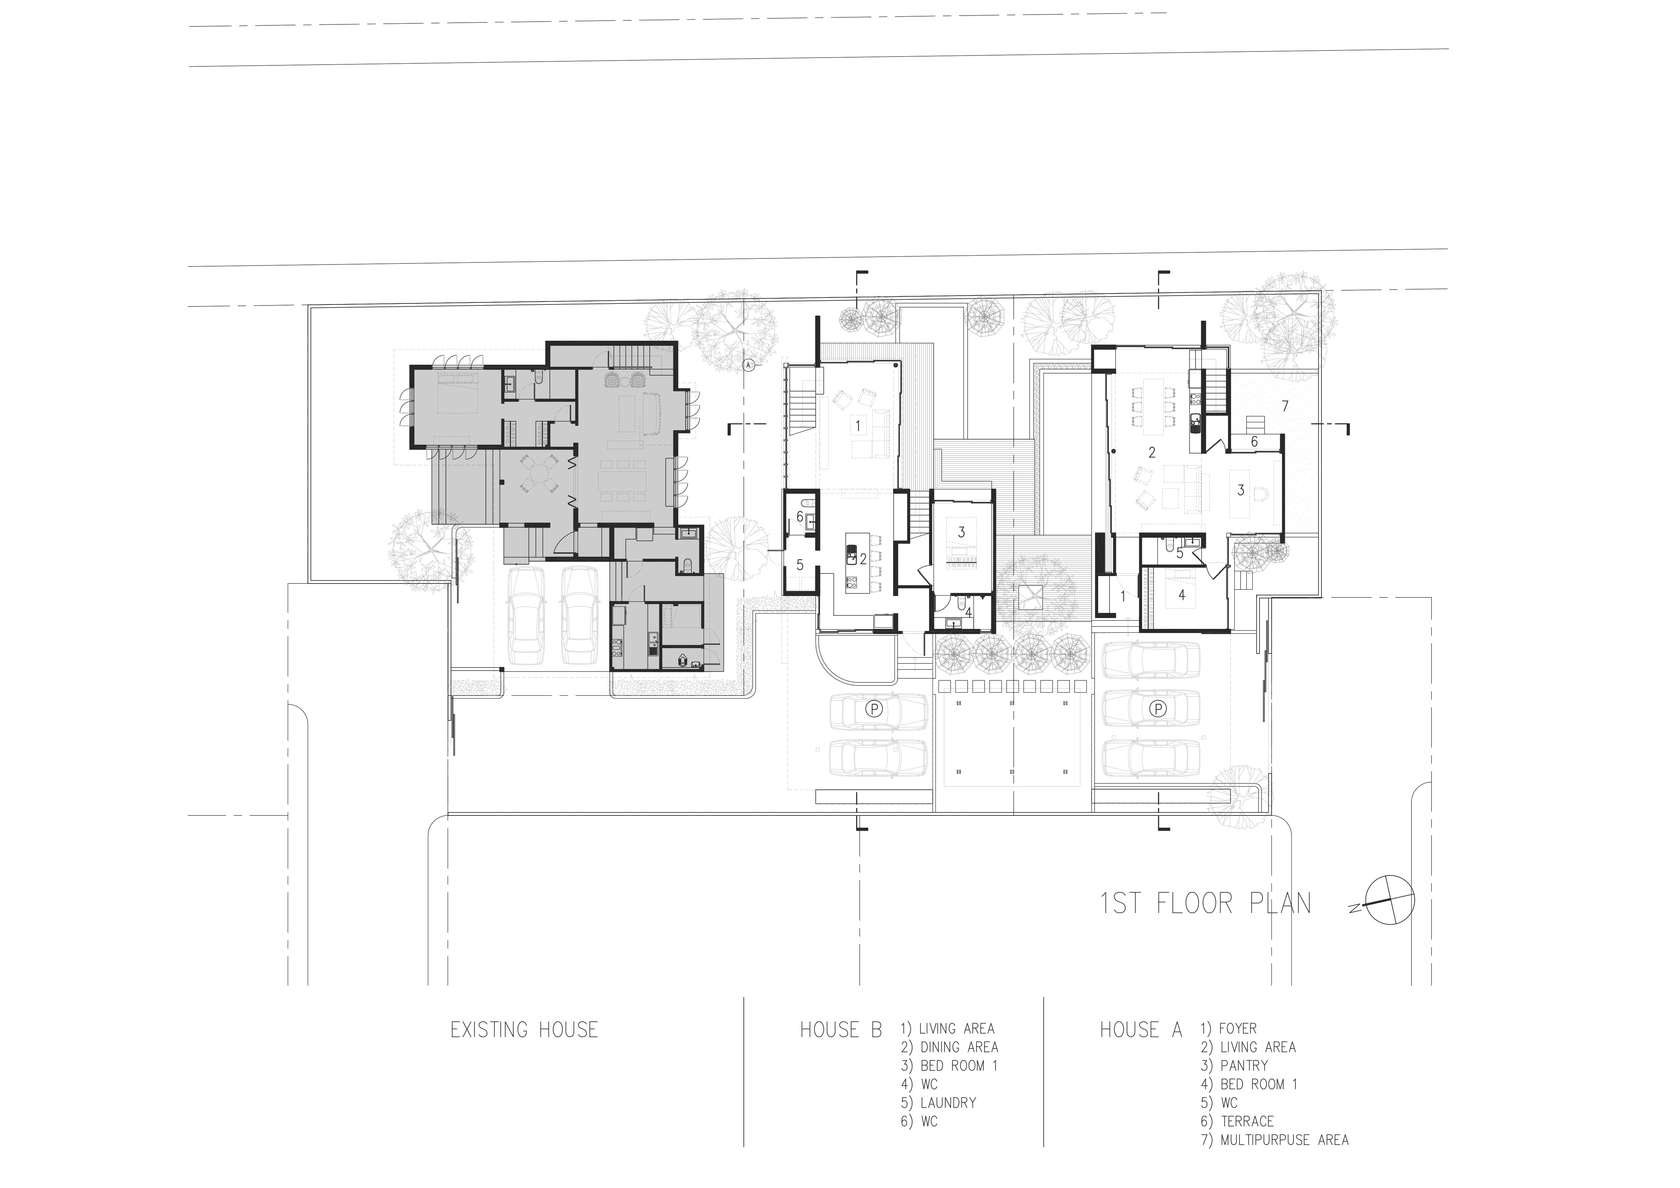 Nichada ground floor